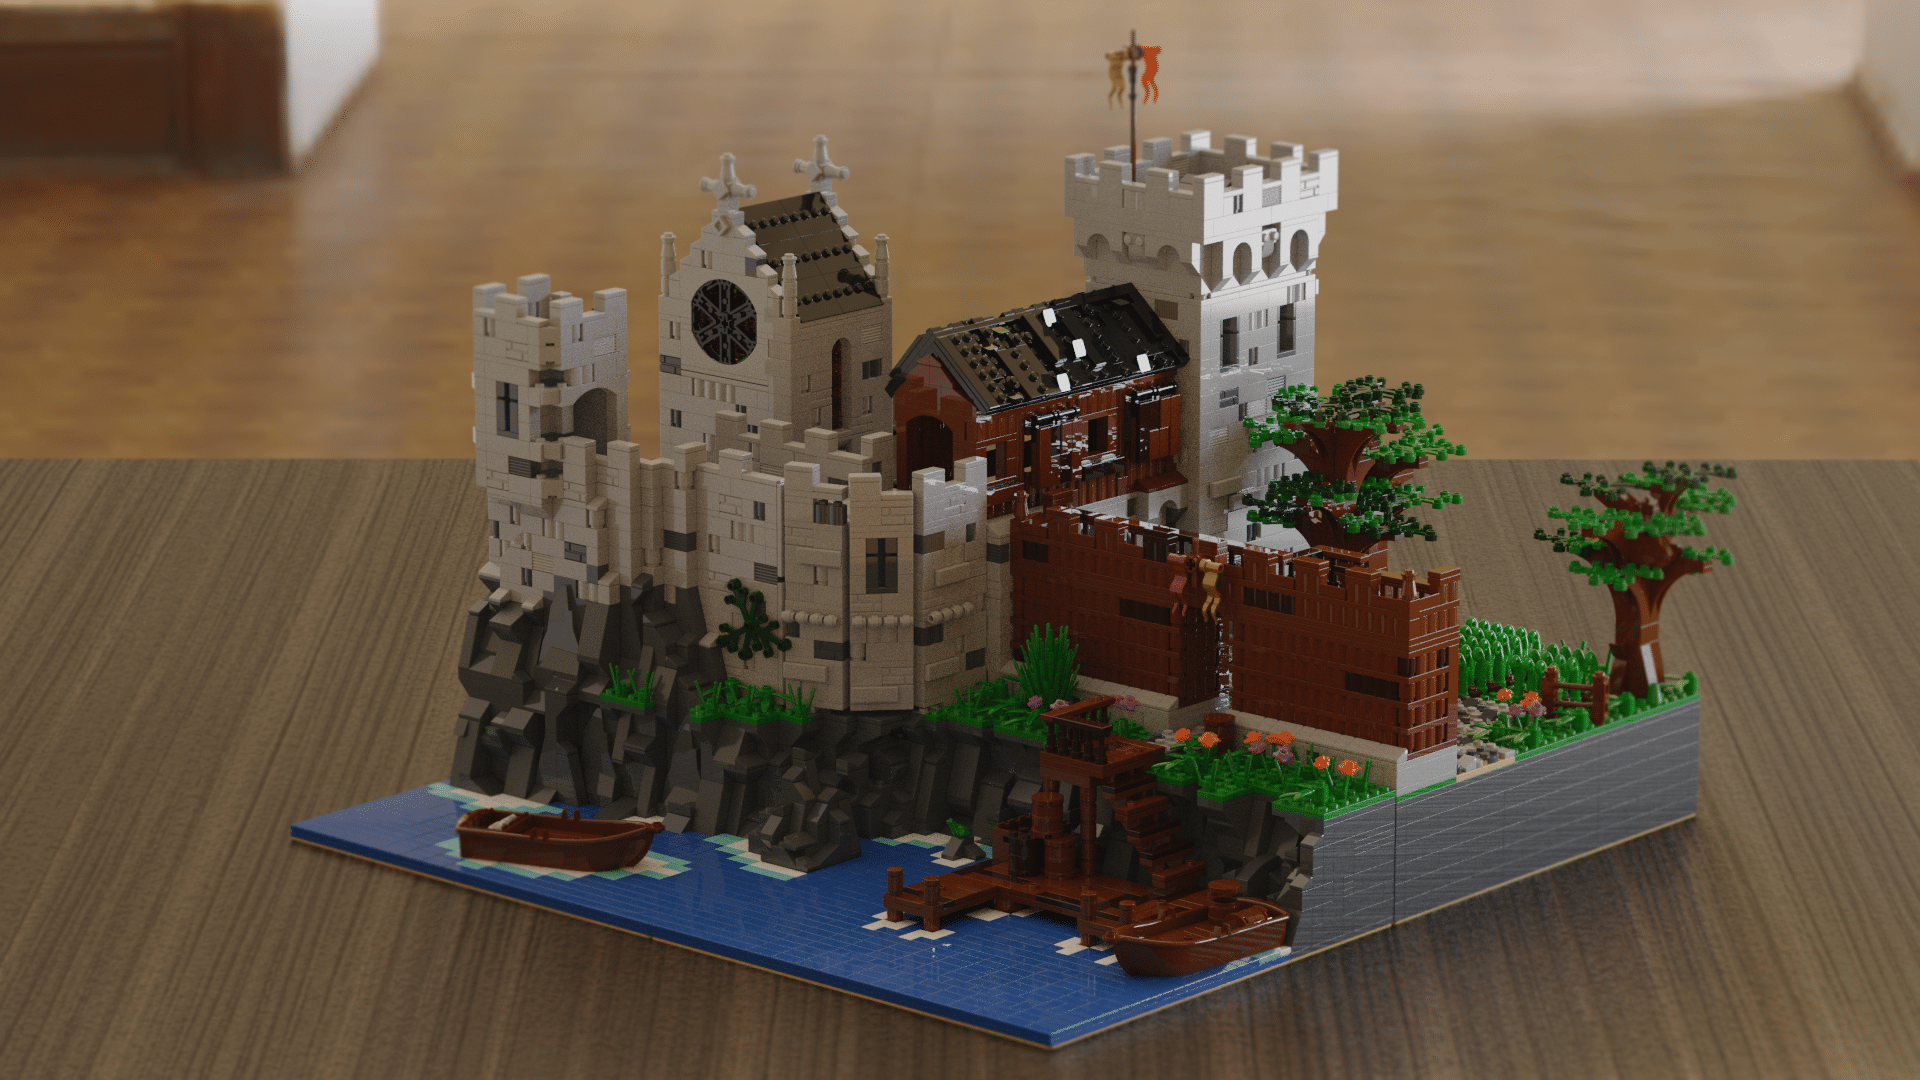 instruction//Anleitung tower//Turm modular Lego MOC medieval castle//Burg